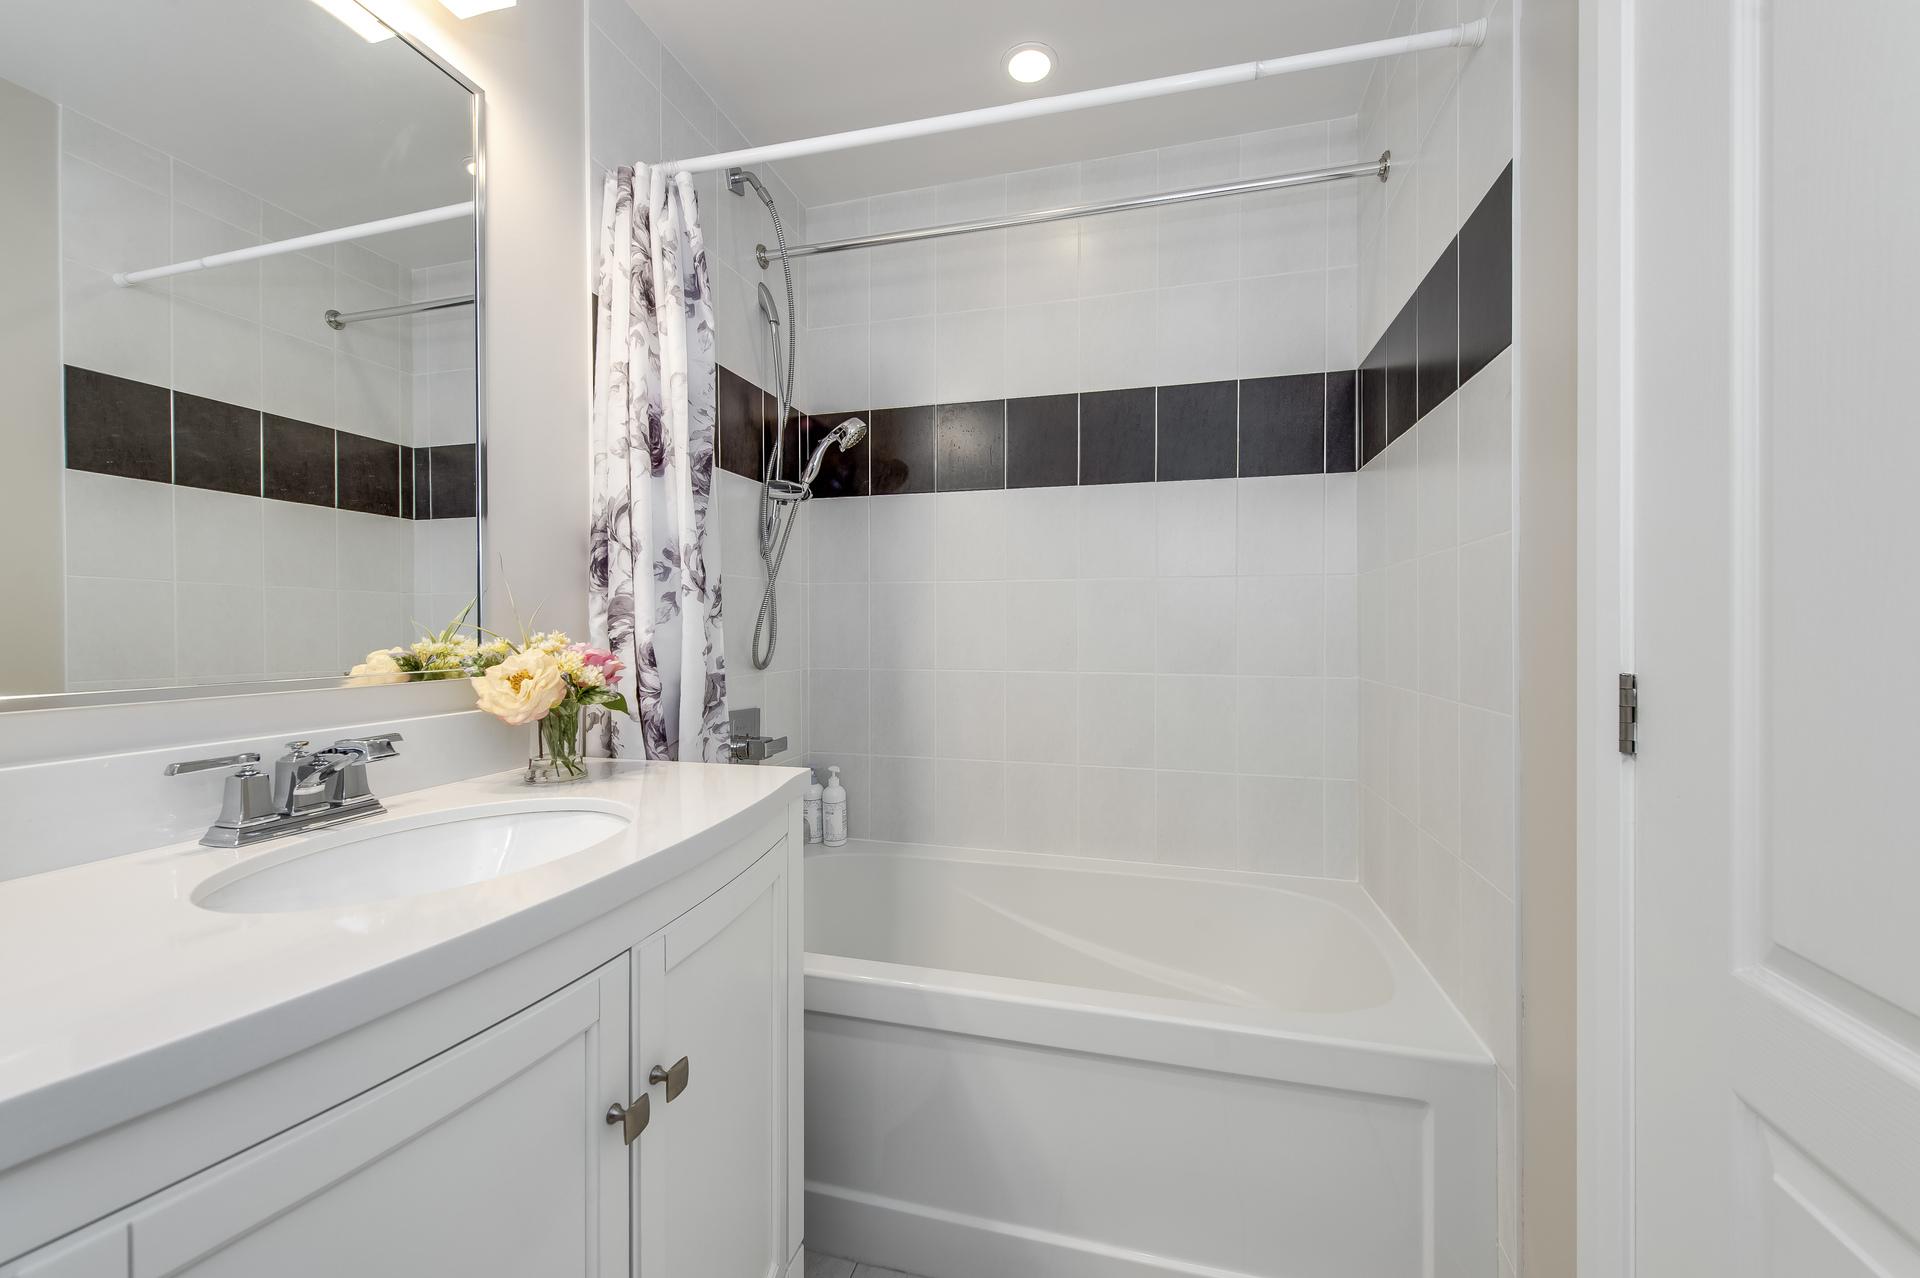 Bathroom - 514-2480 Price Michael Dr, Oakville - Elite3 & Team at 514 - 2480 Prince Michael Drive, Iroquois Ridge North, Oakville